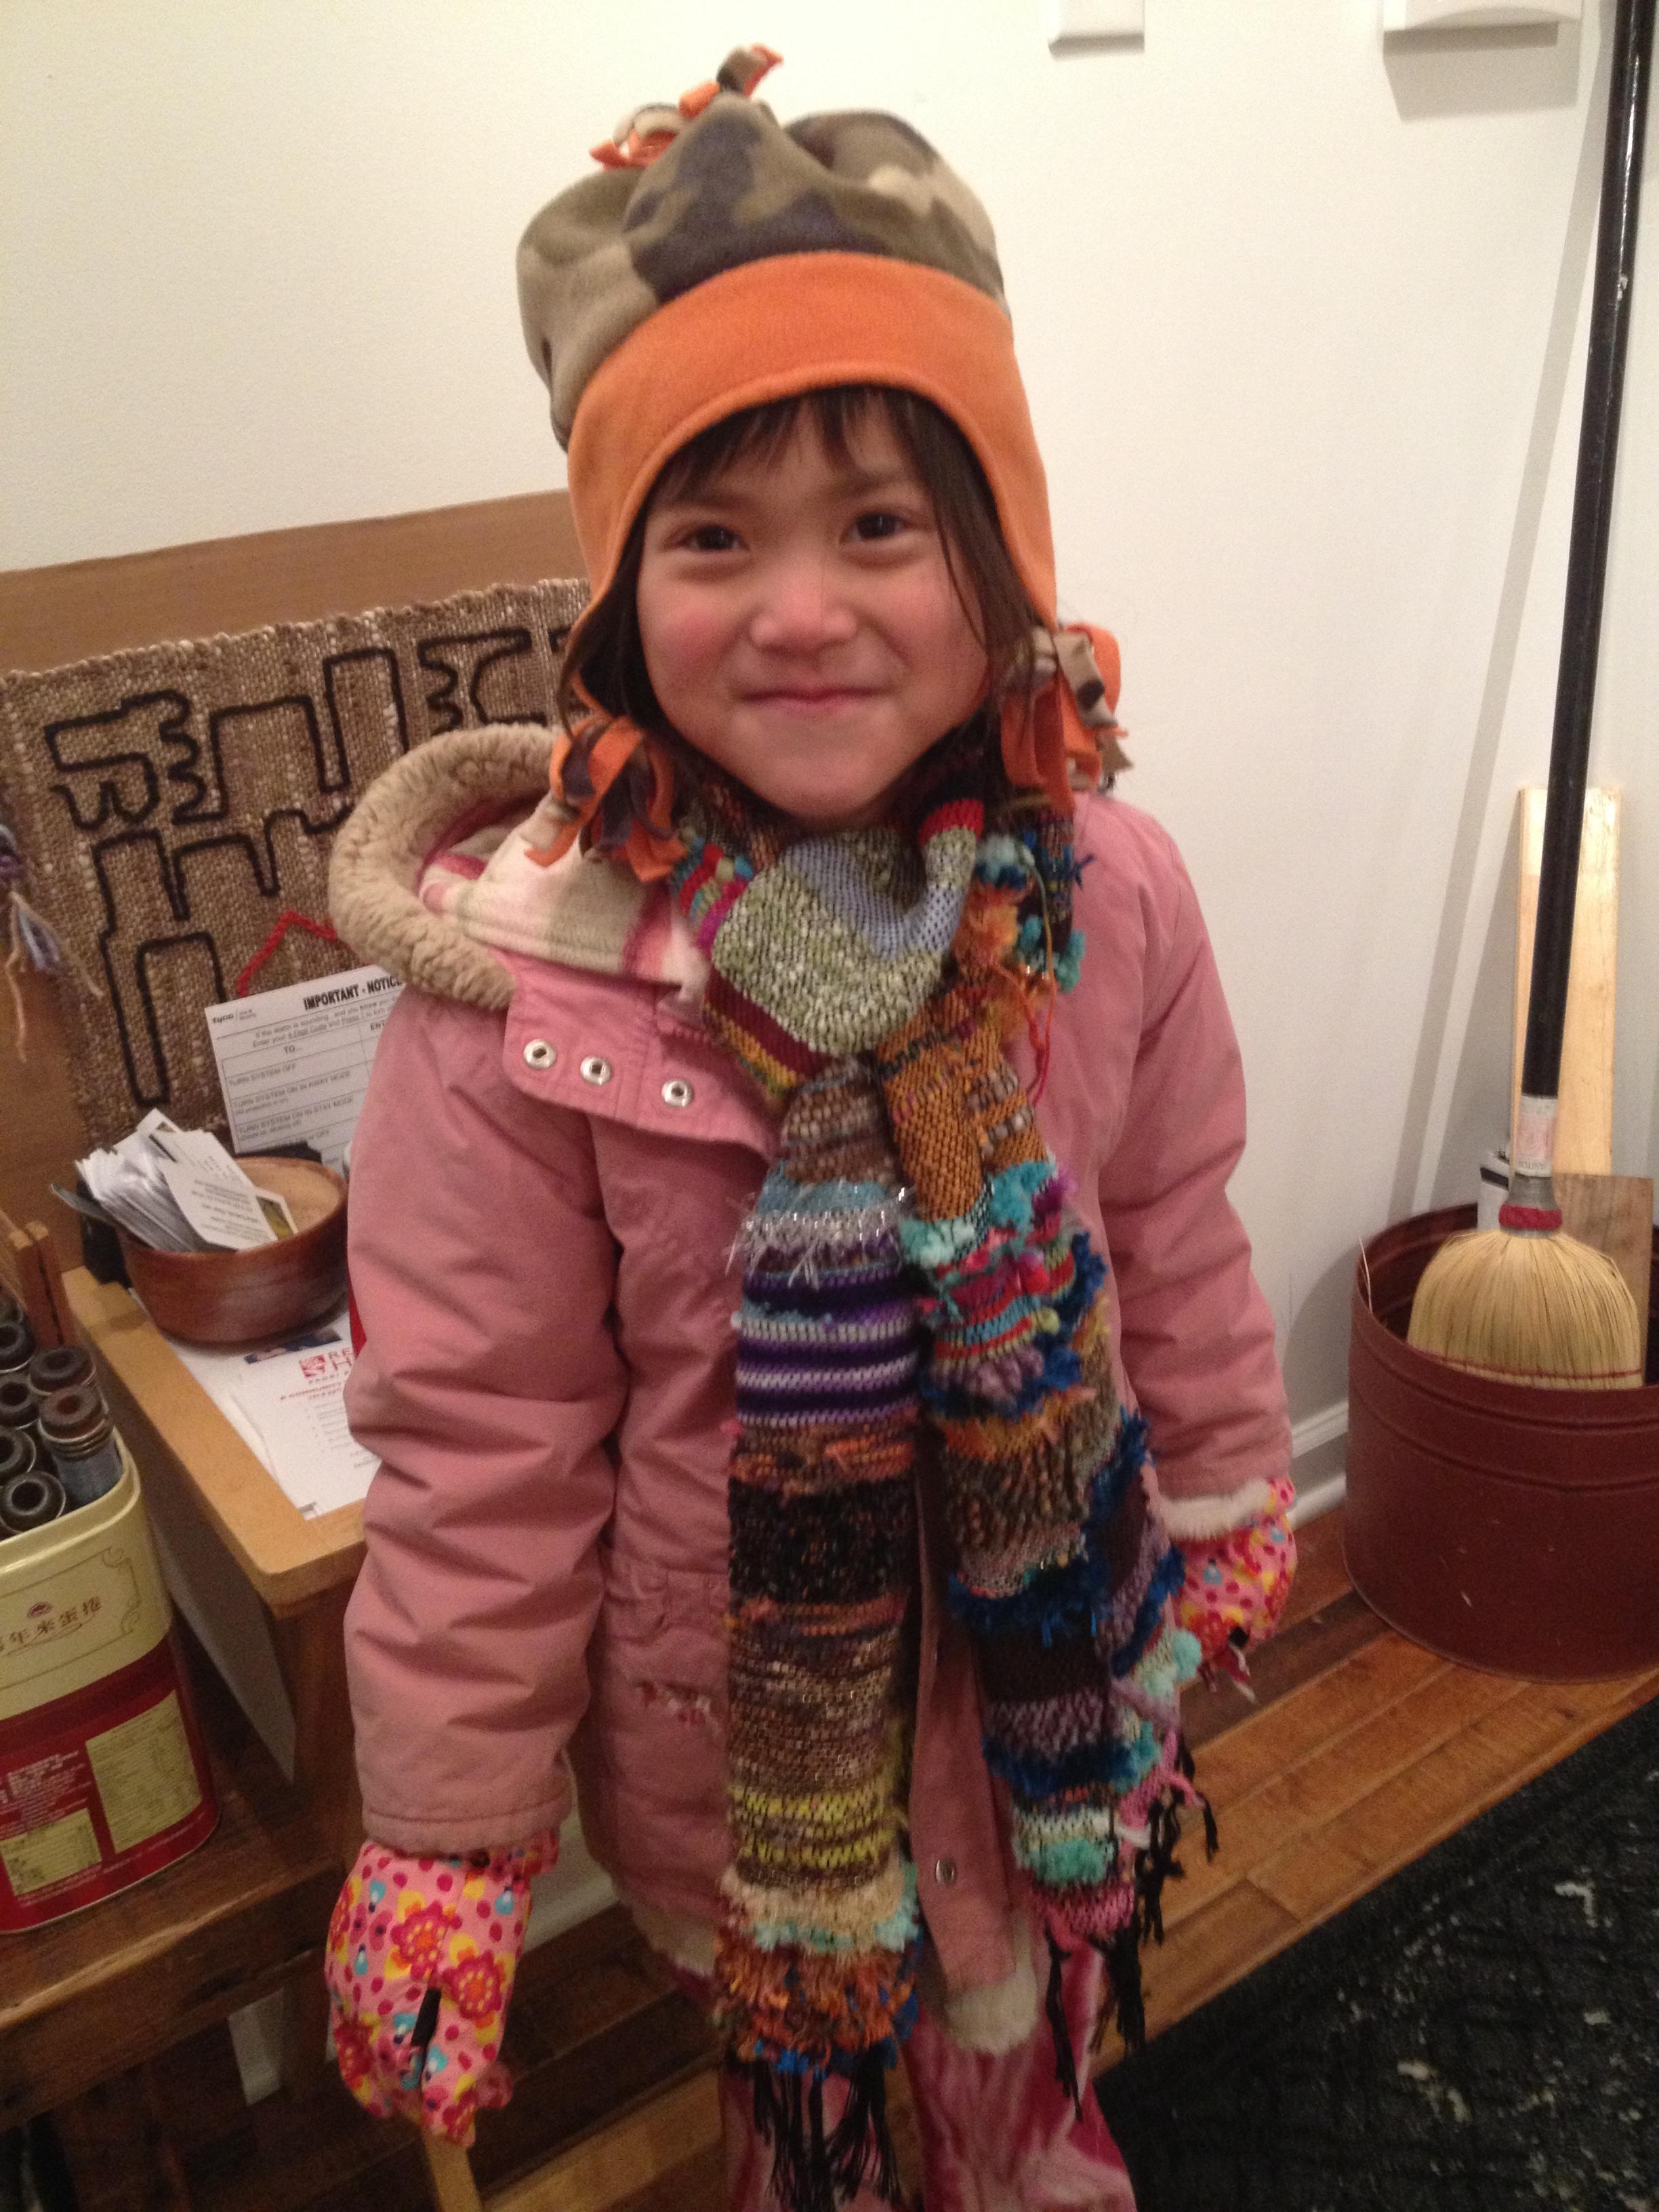 2014-01-22 Zoe's scarf!.jpg